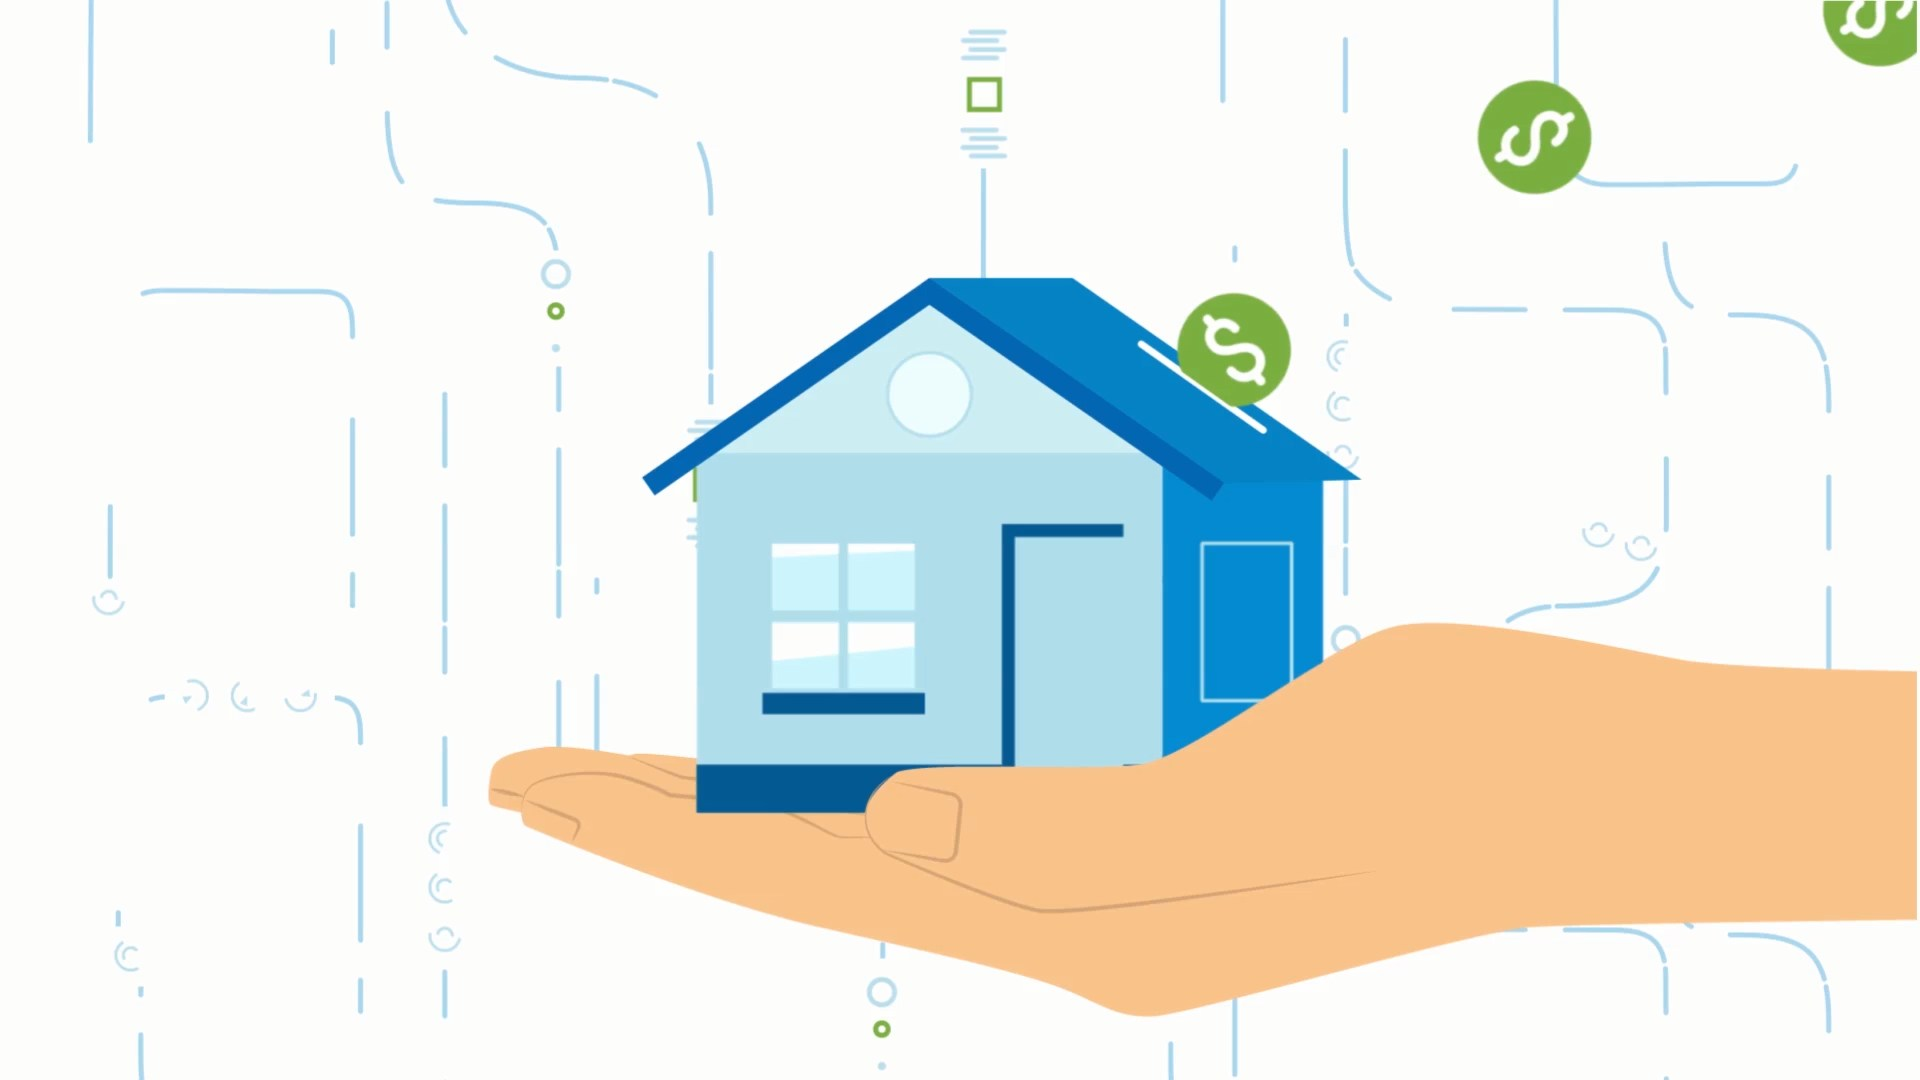 Pacefunding house scene